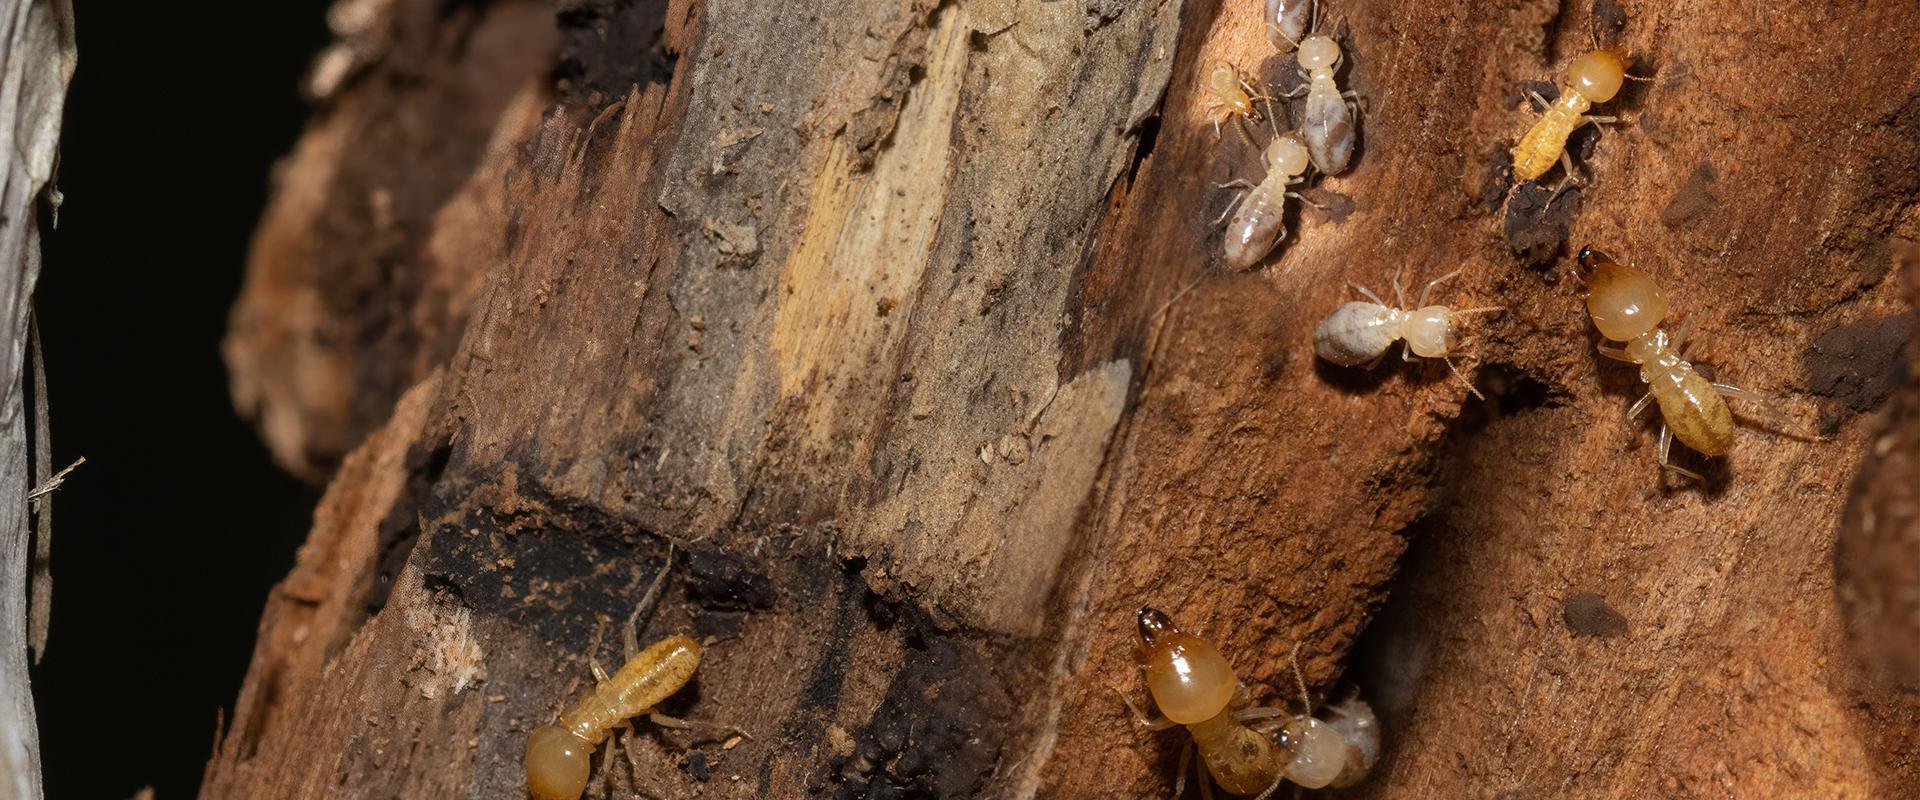 termites on wood in oklahoma city